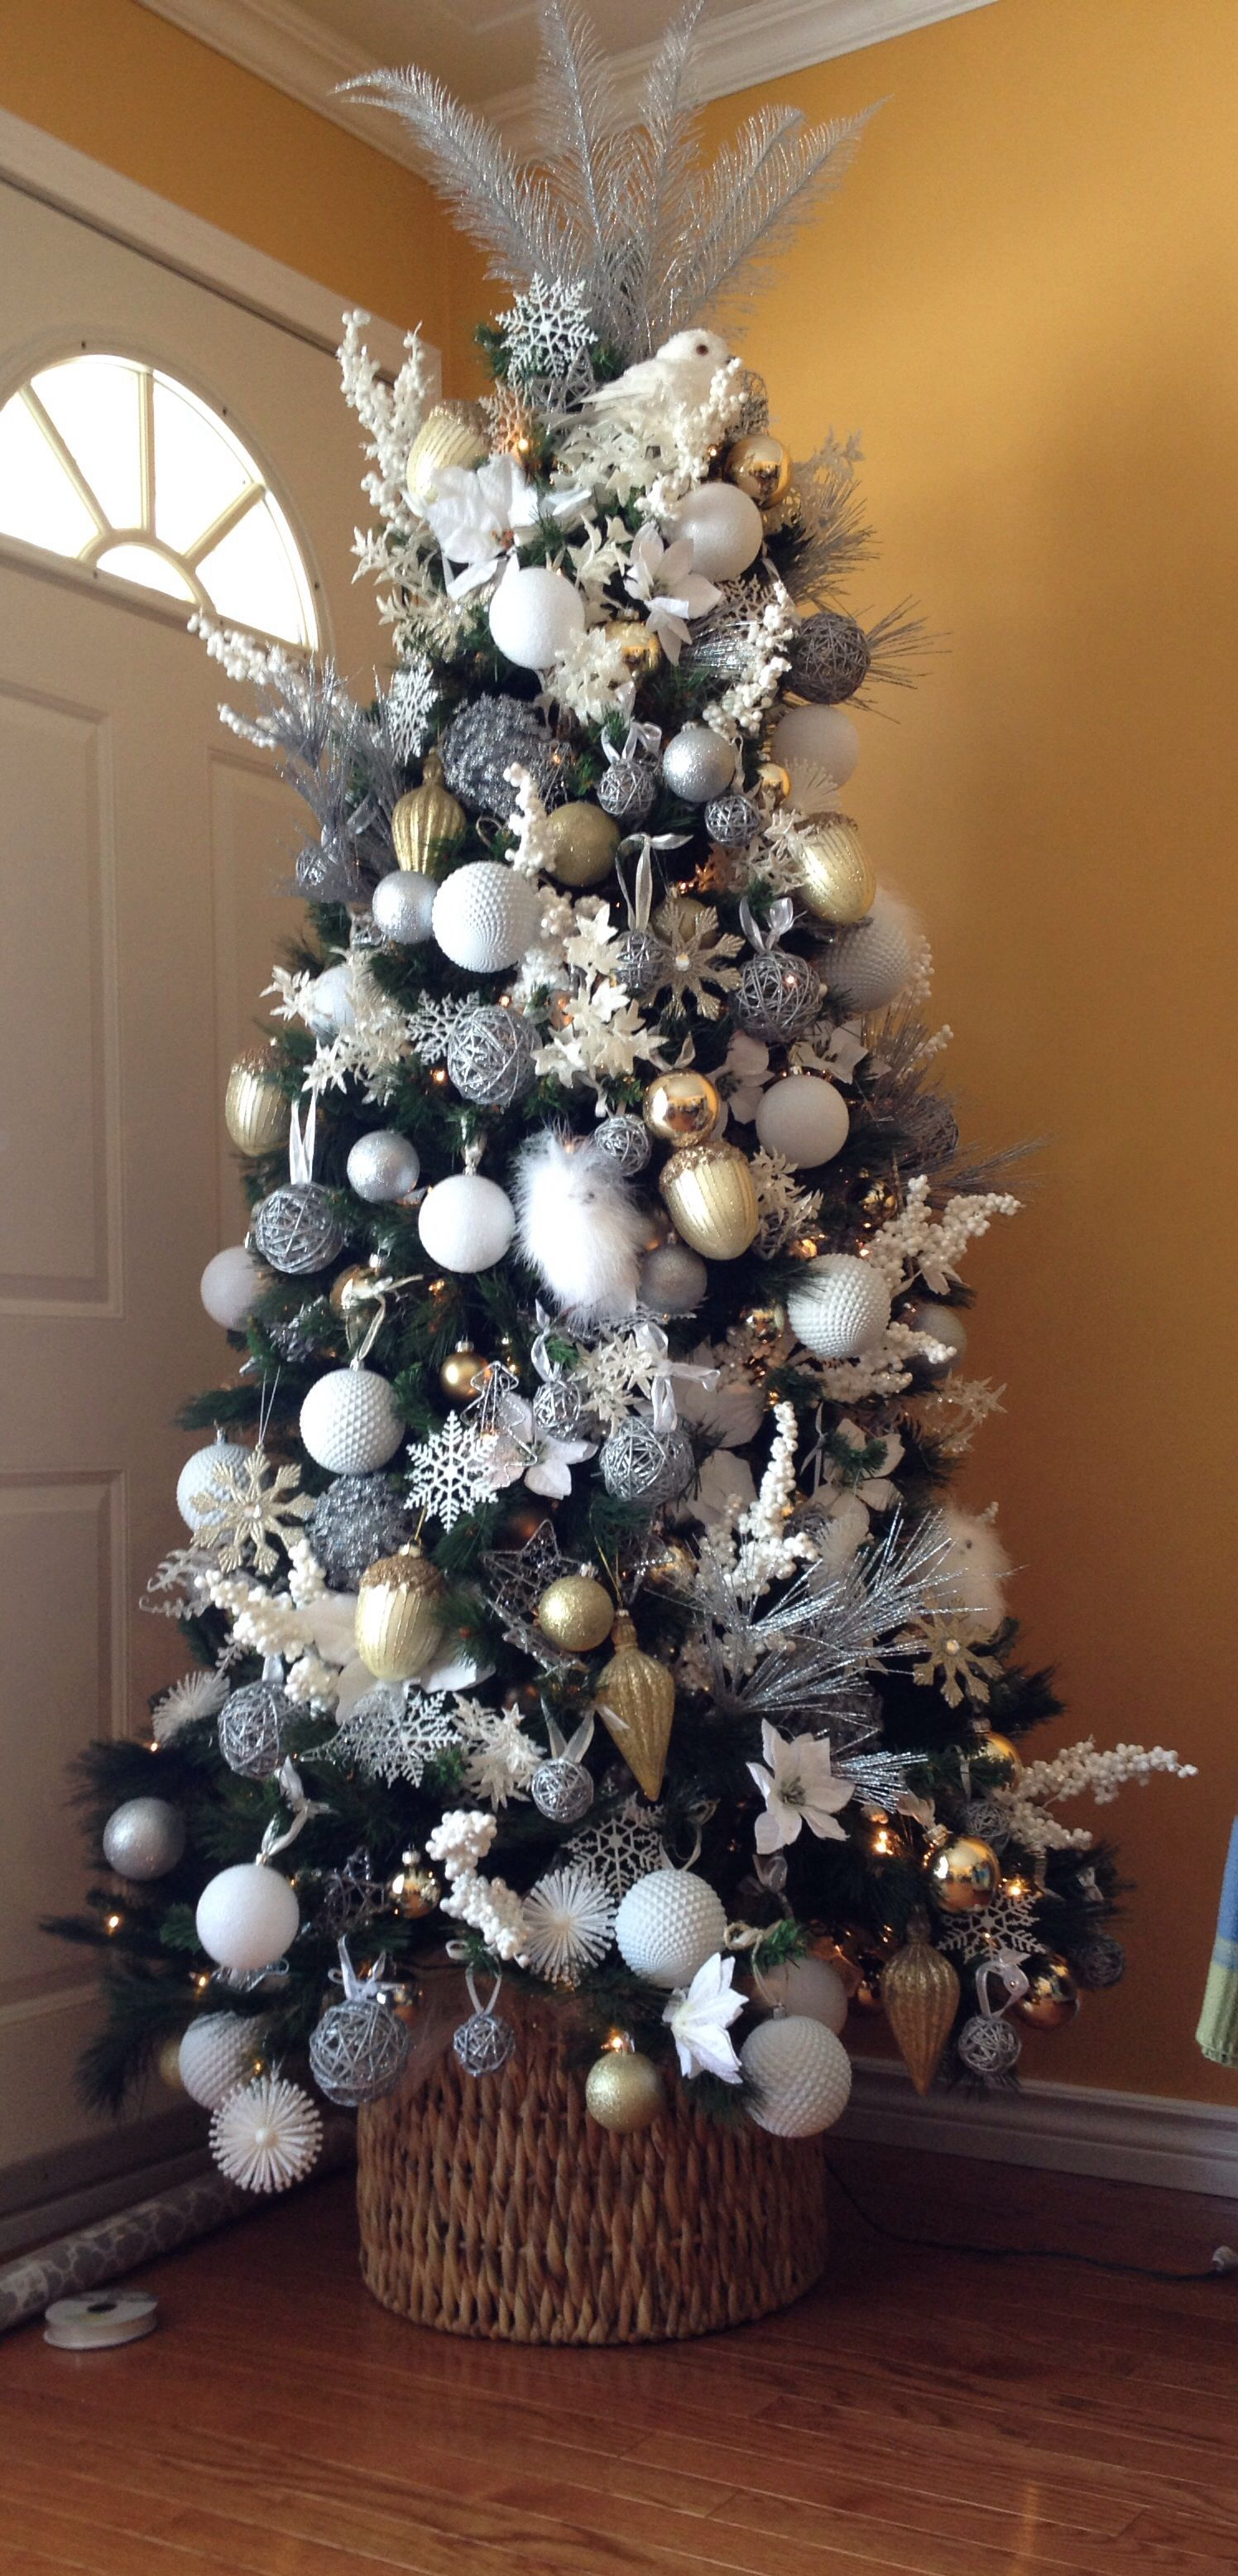 Christmas tree silver and white christmas pinterest - Silver and white christmas ...